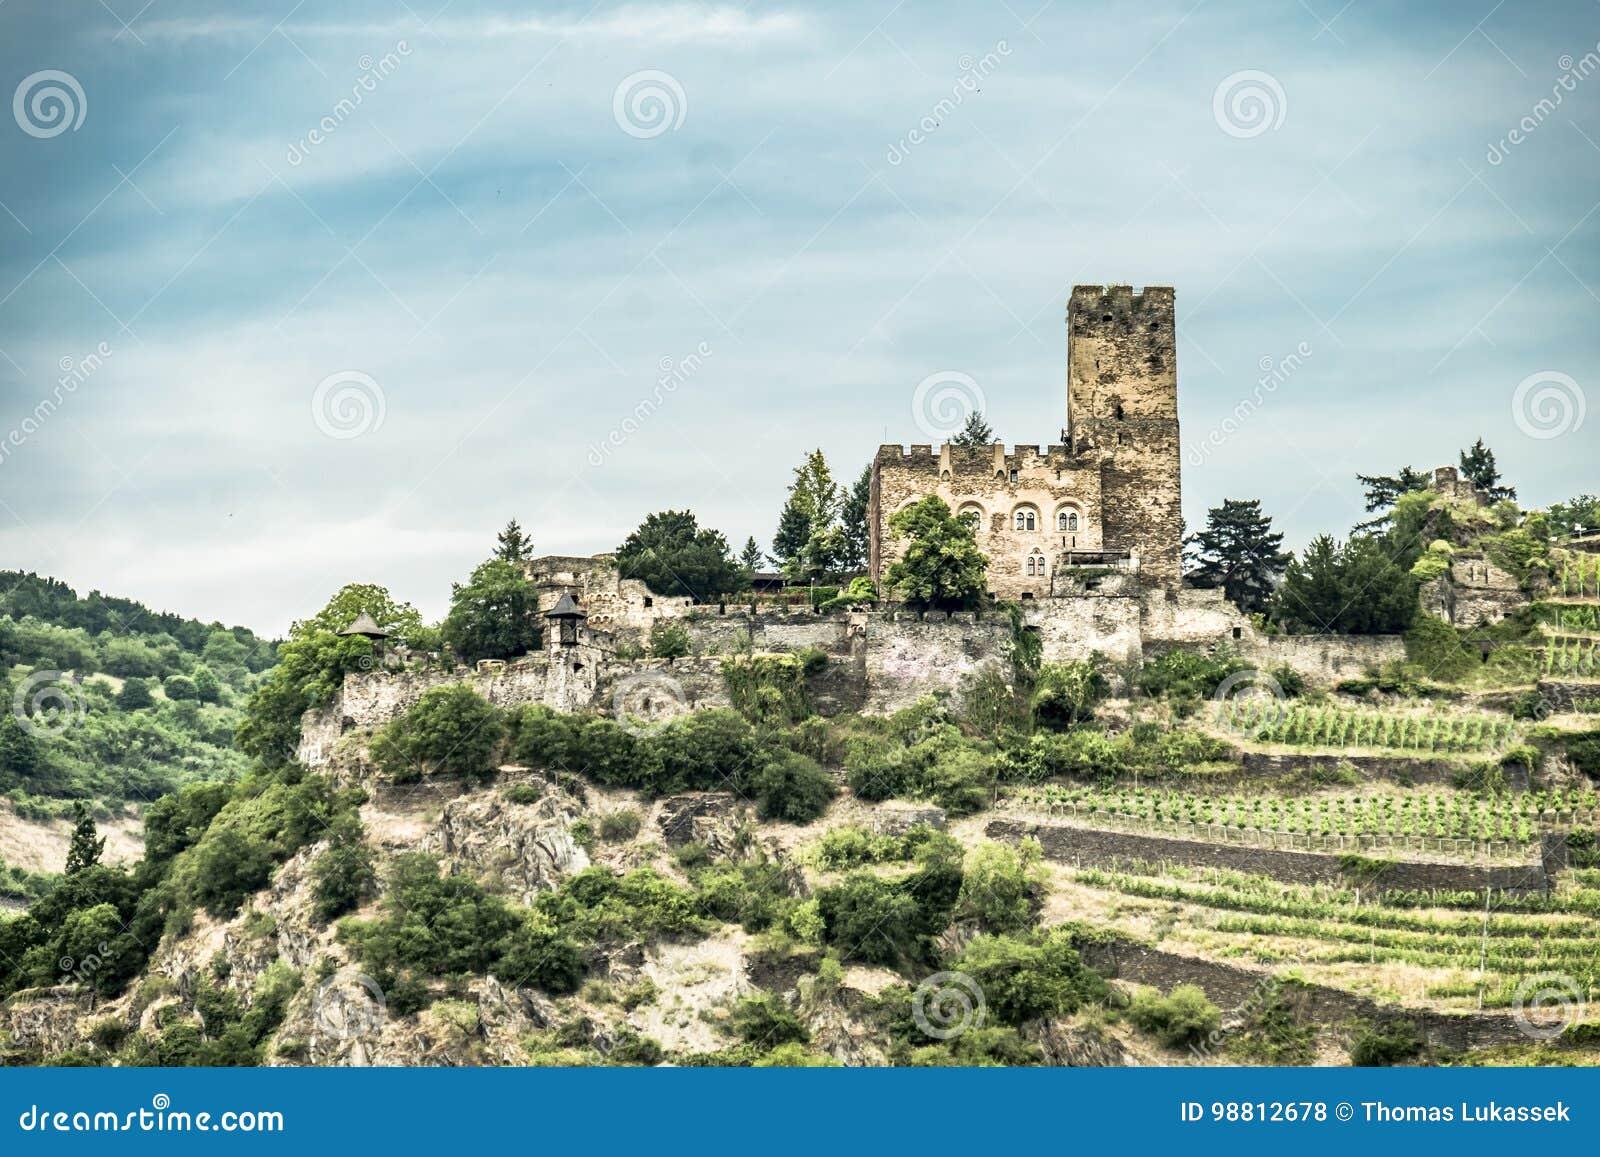 Landmark Gutenfels castle at Kaub in the famous Rhine Gorge north of Rudesheim